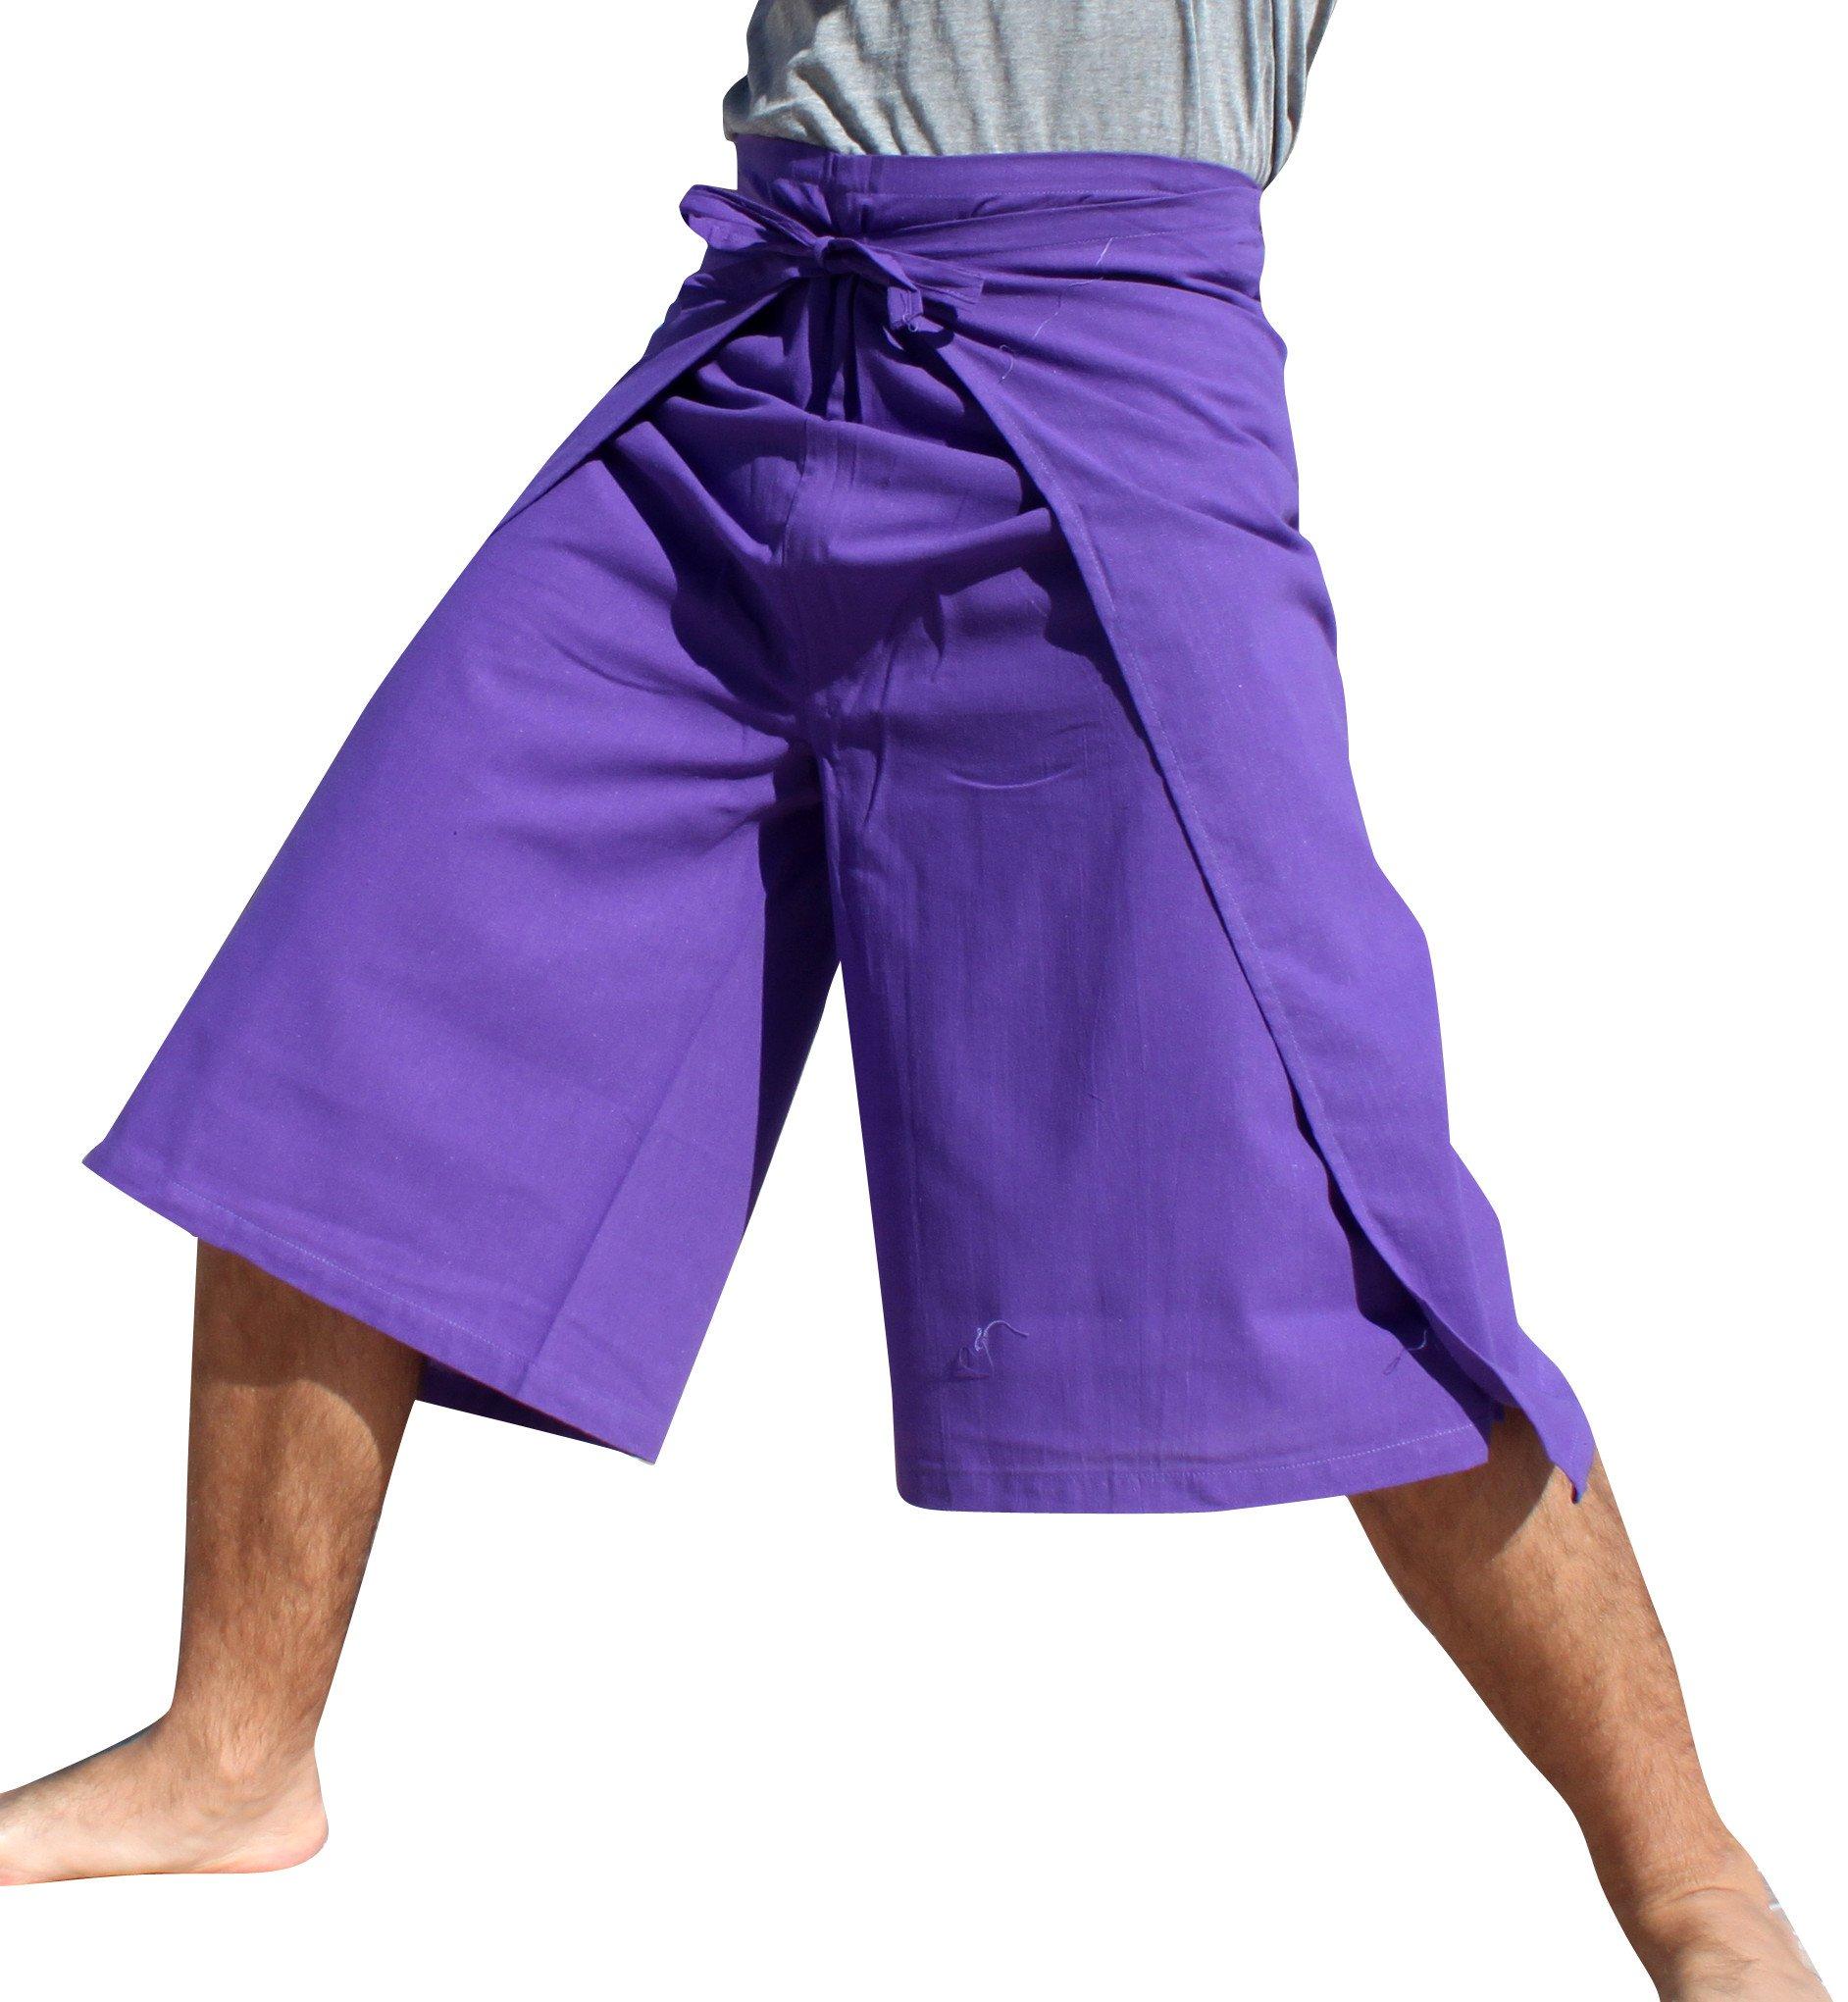 RaanPahMuang Drive In Wrap Pants In Summer Plain Mixed Cotton, Medium, Aum Cotton - Amethyst Violet by RaanPahMuang